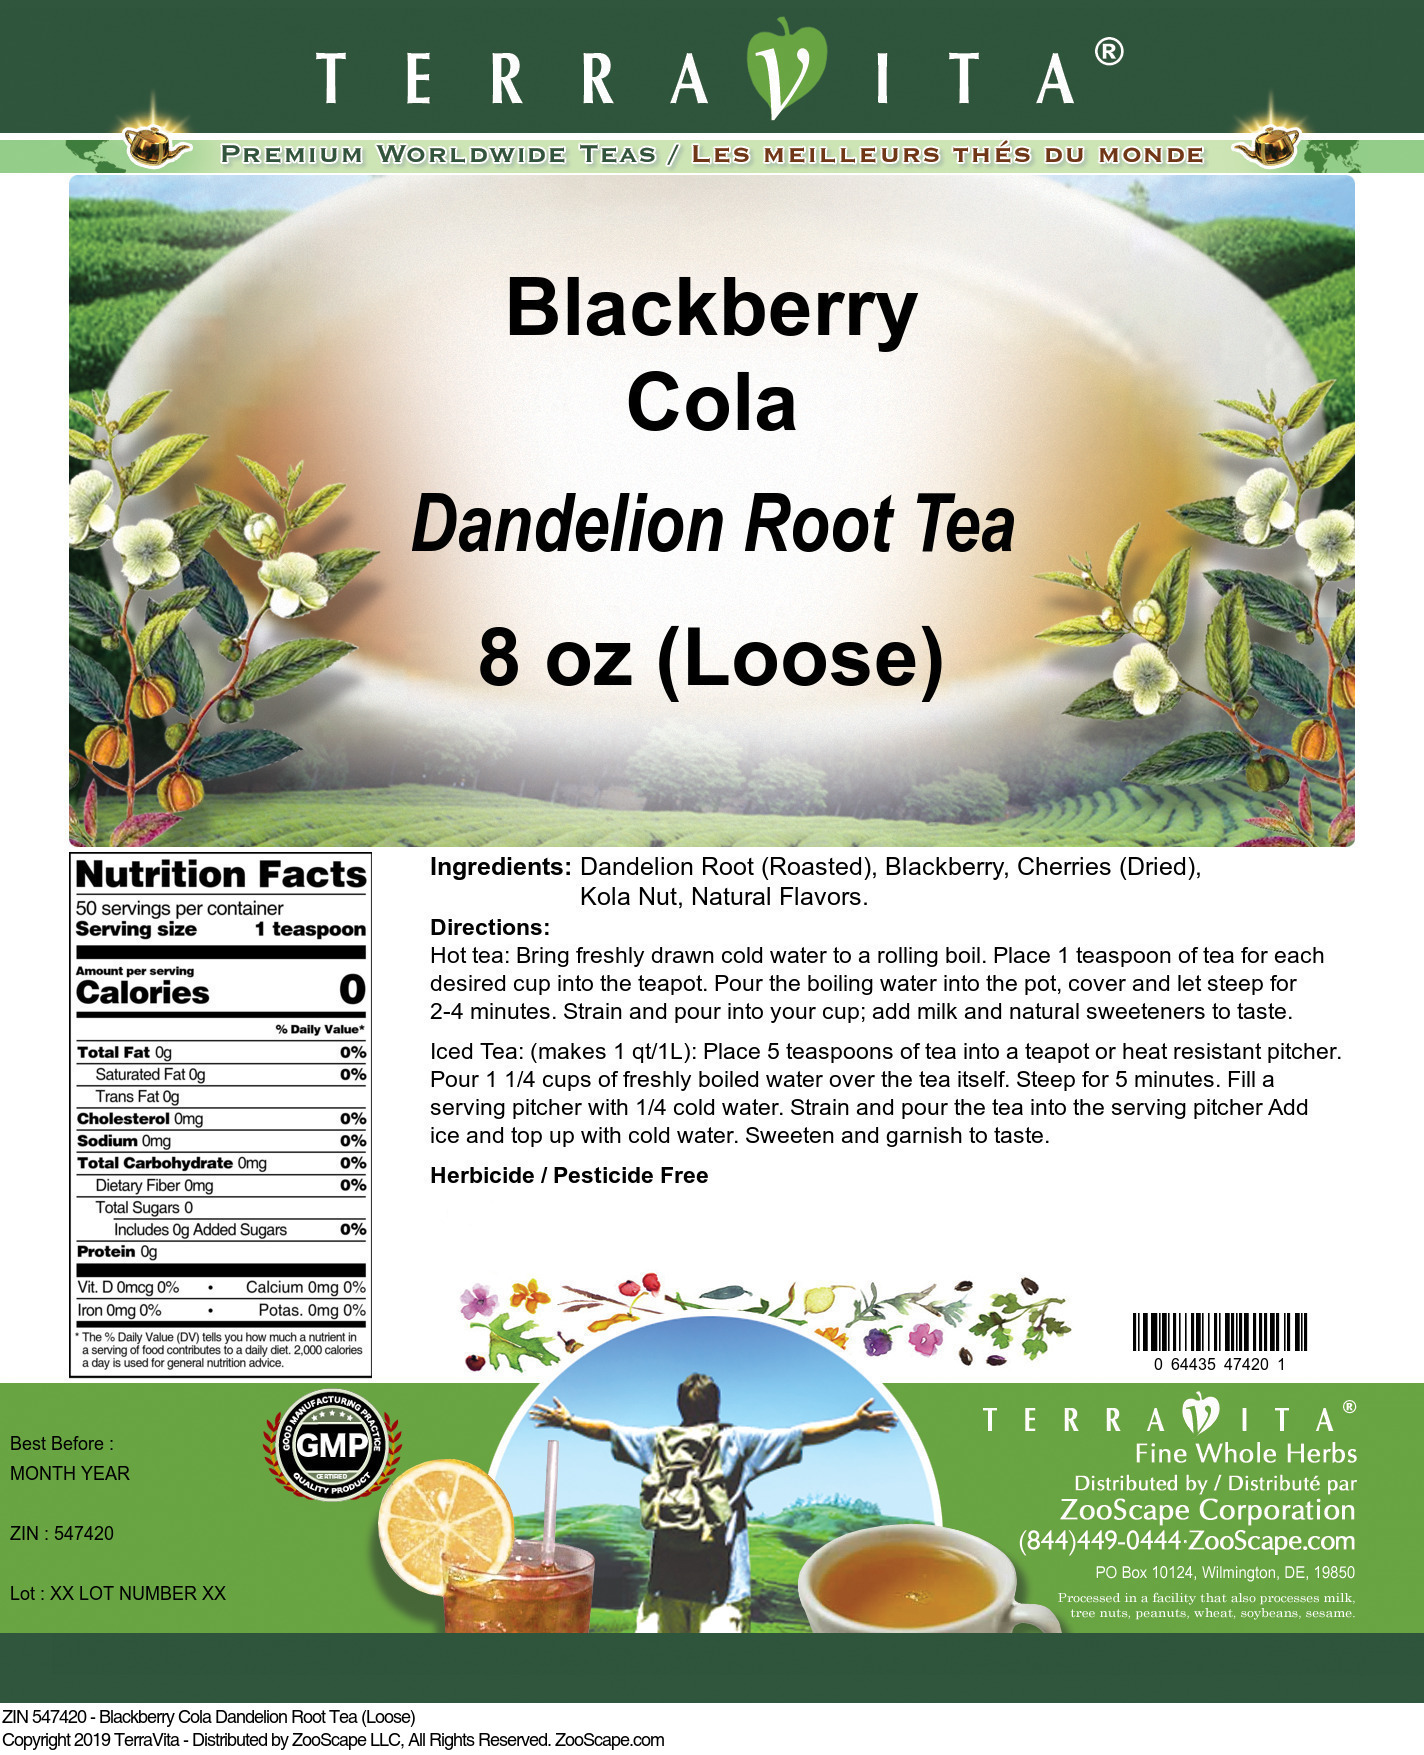 Blackberry Cola Dandelion Root Tea (Loose)